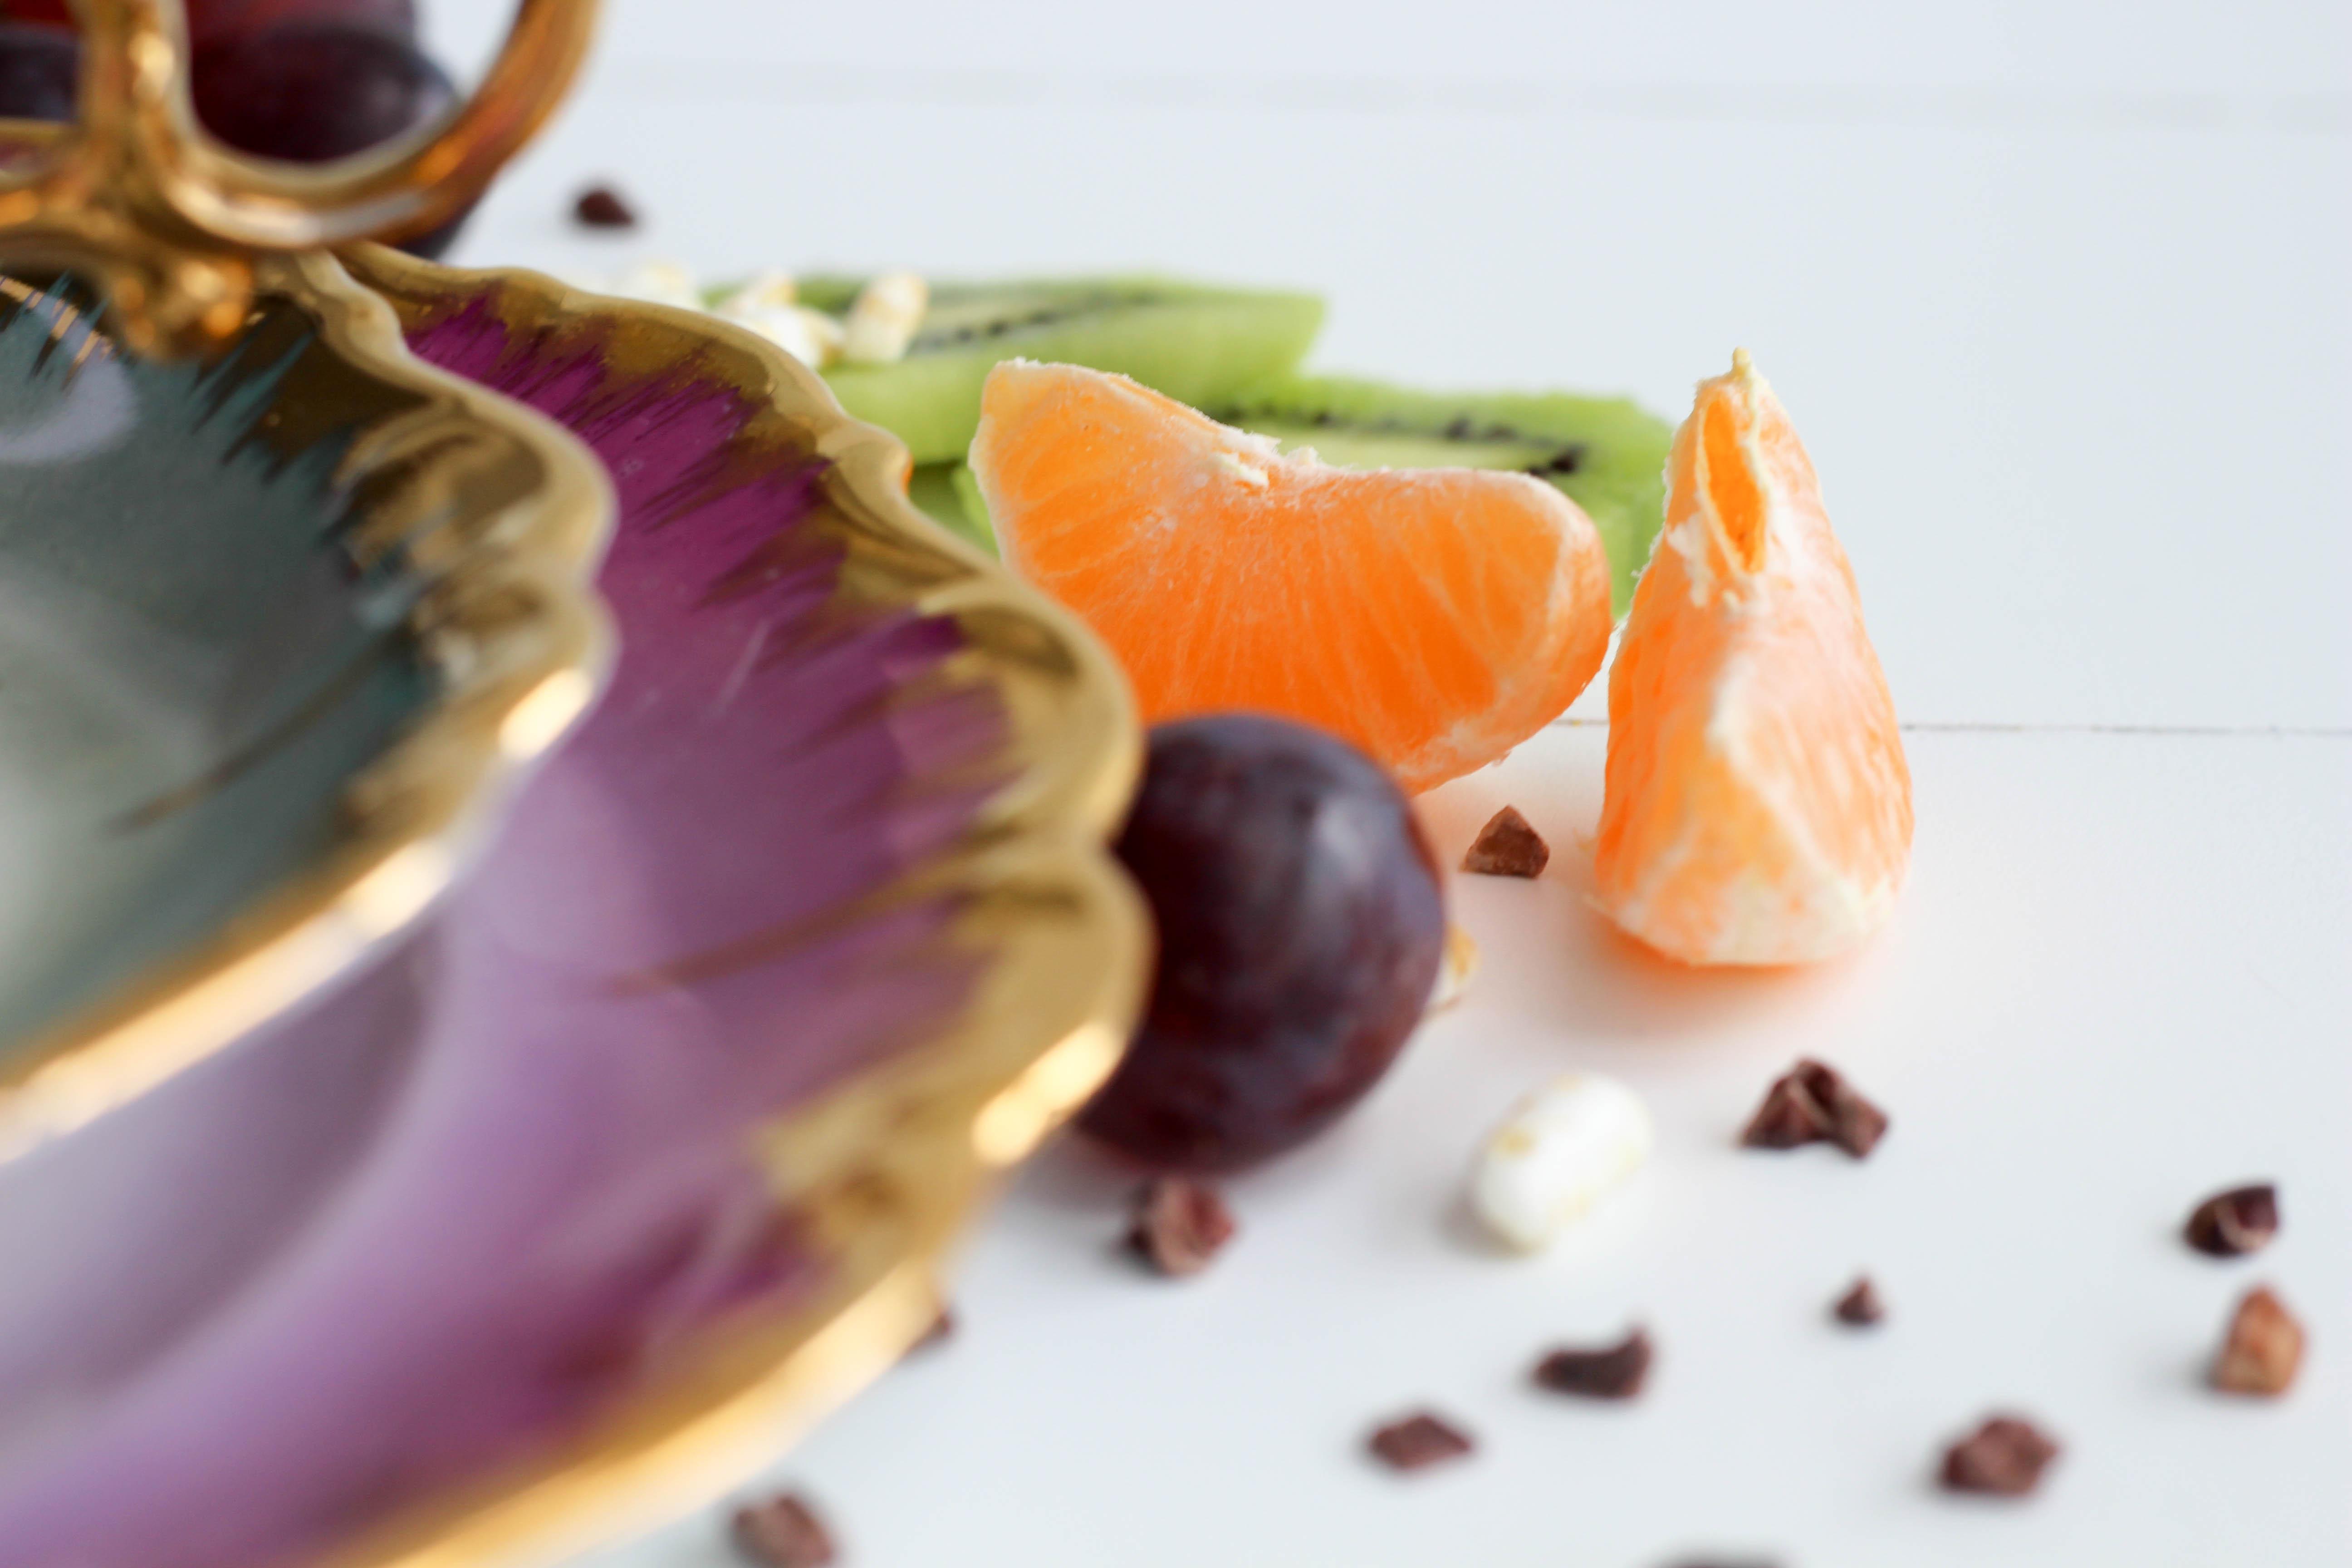 Vegan - Winter - Homespa - Bowl - Weintrauben - Kiwi - Raw - cacao - Tasse - lila - healtyfood